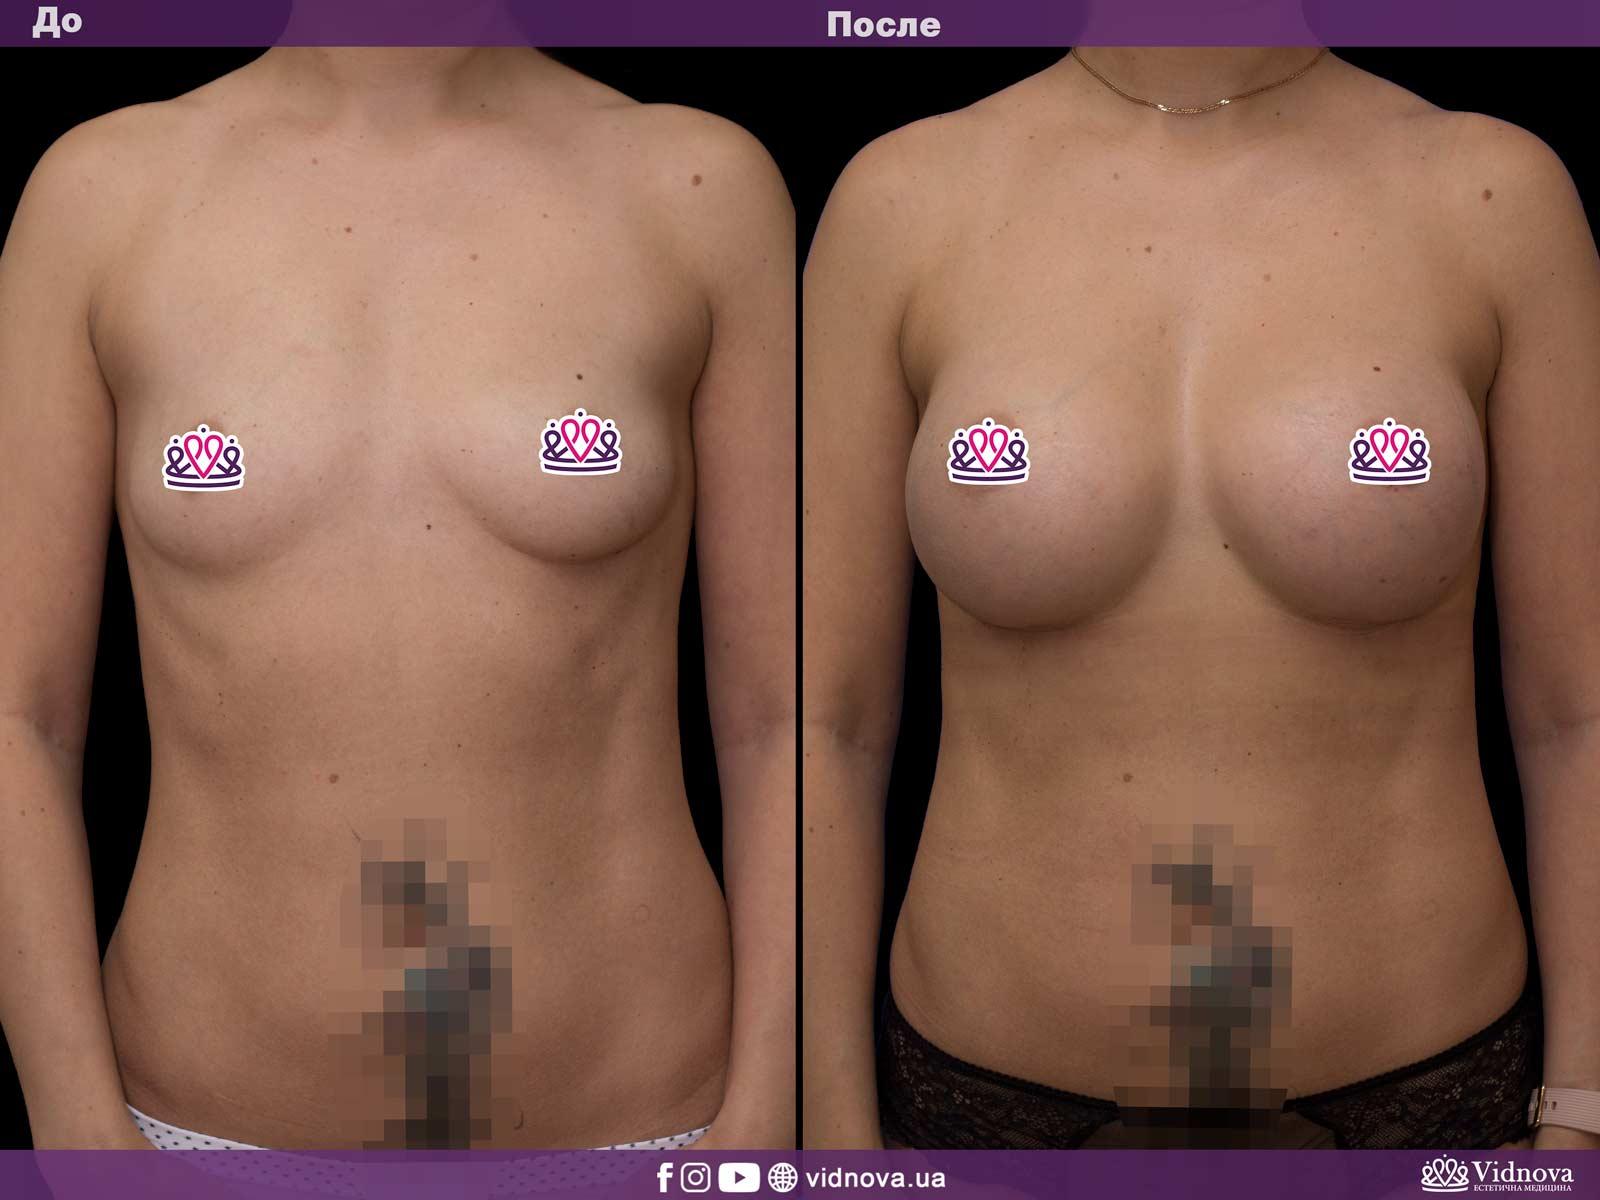 Увеличение груди: Фото ДО и ПОСЛЕ - Пример №39-1 - Клиника Vidnova